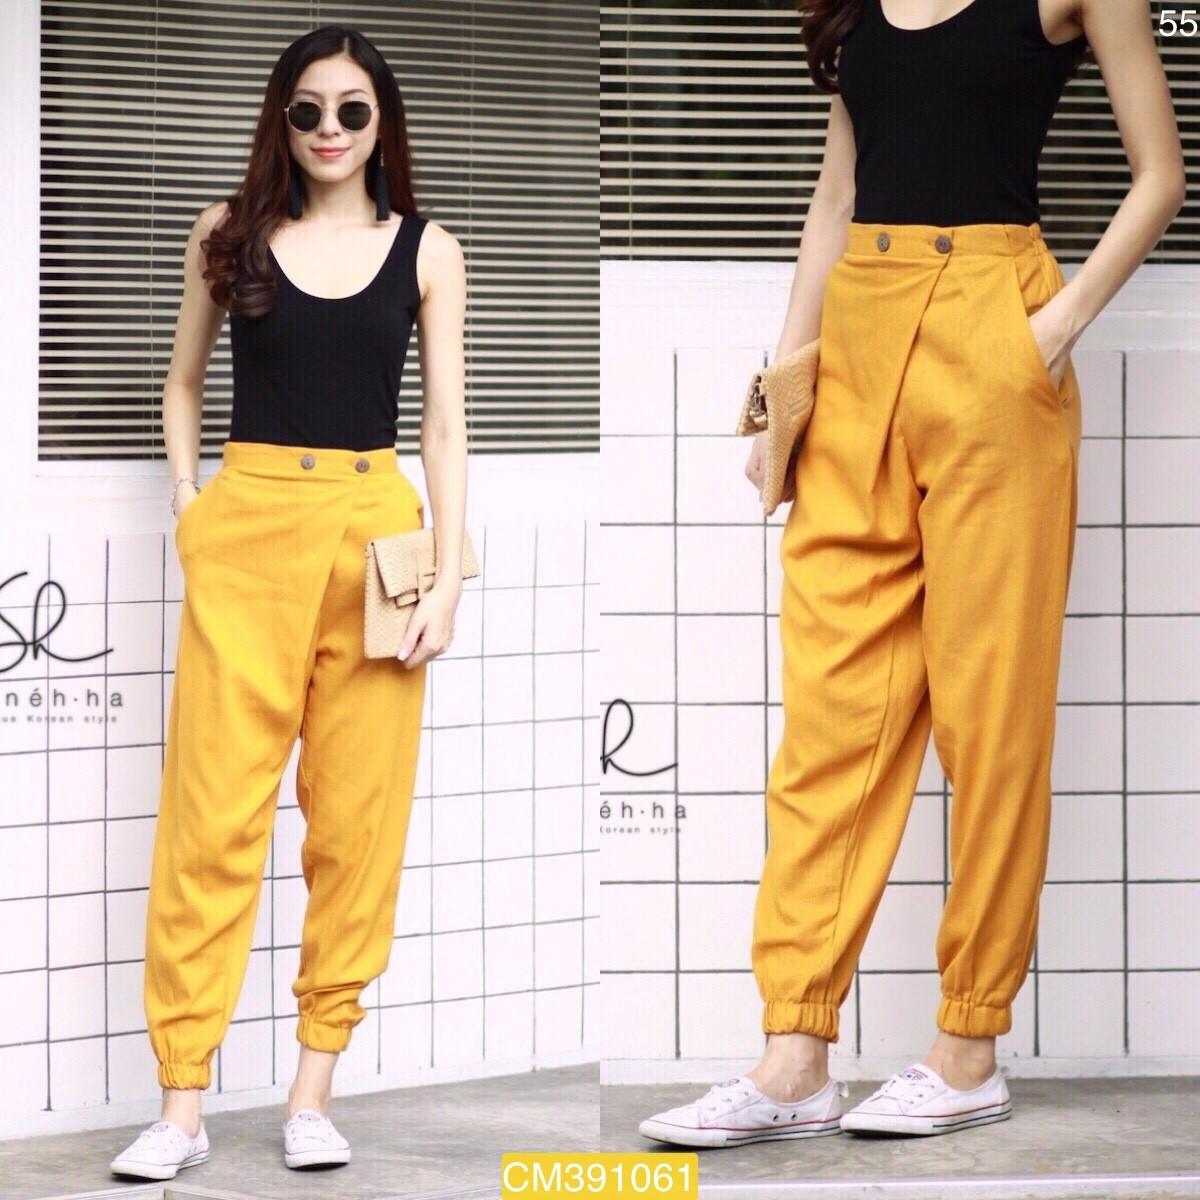 "CM1061 *สีเหลือง* เอว30-35"" กางเกงผ้าฝ้ายรุ่นขายดี แนววินเทจ"